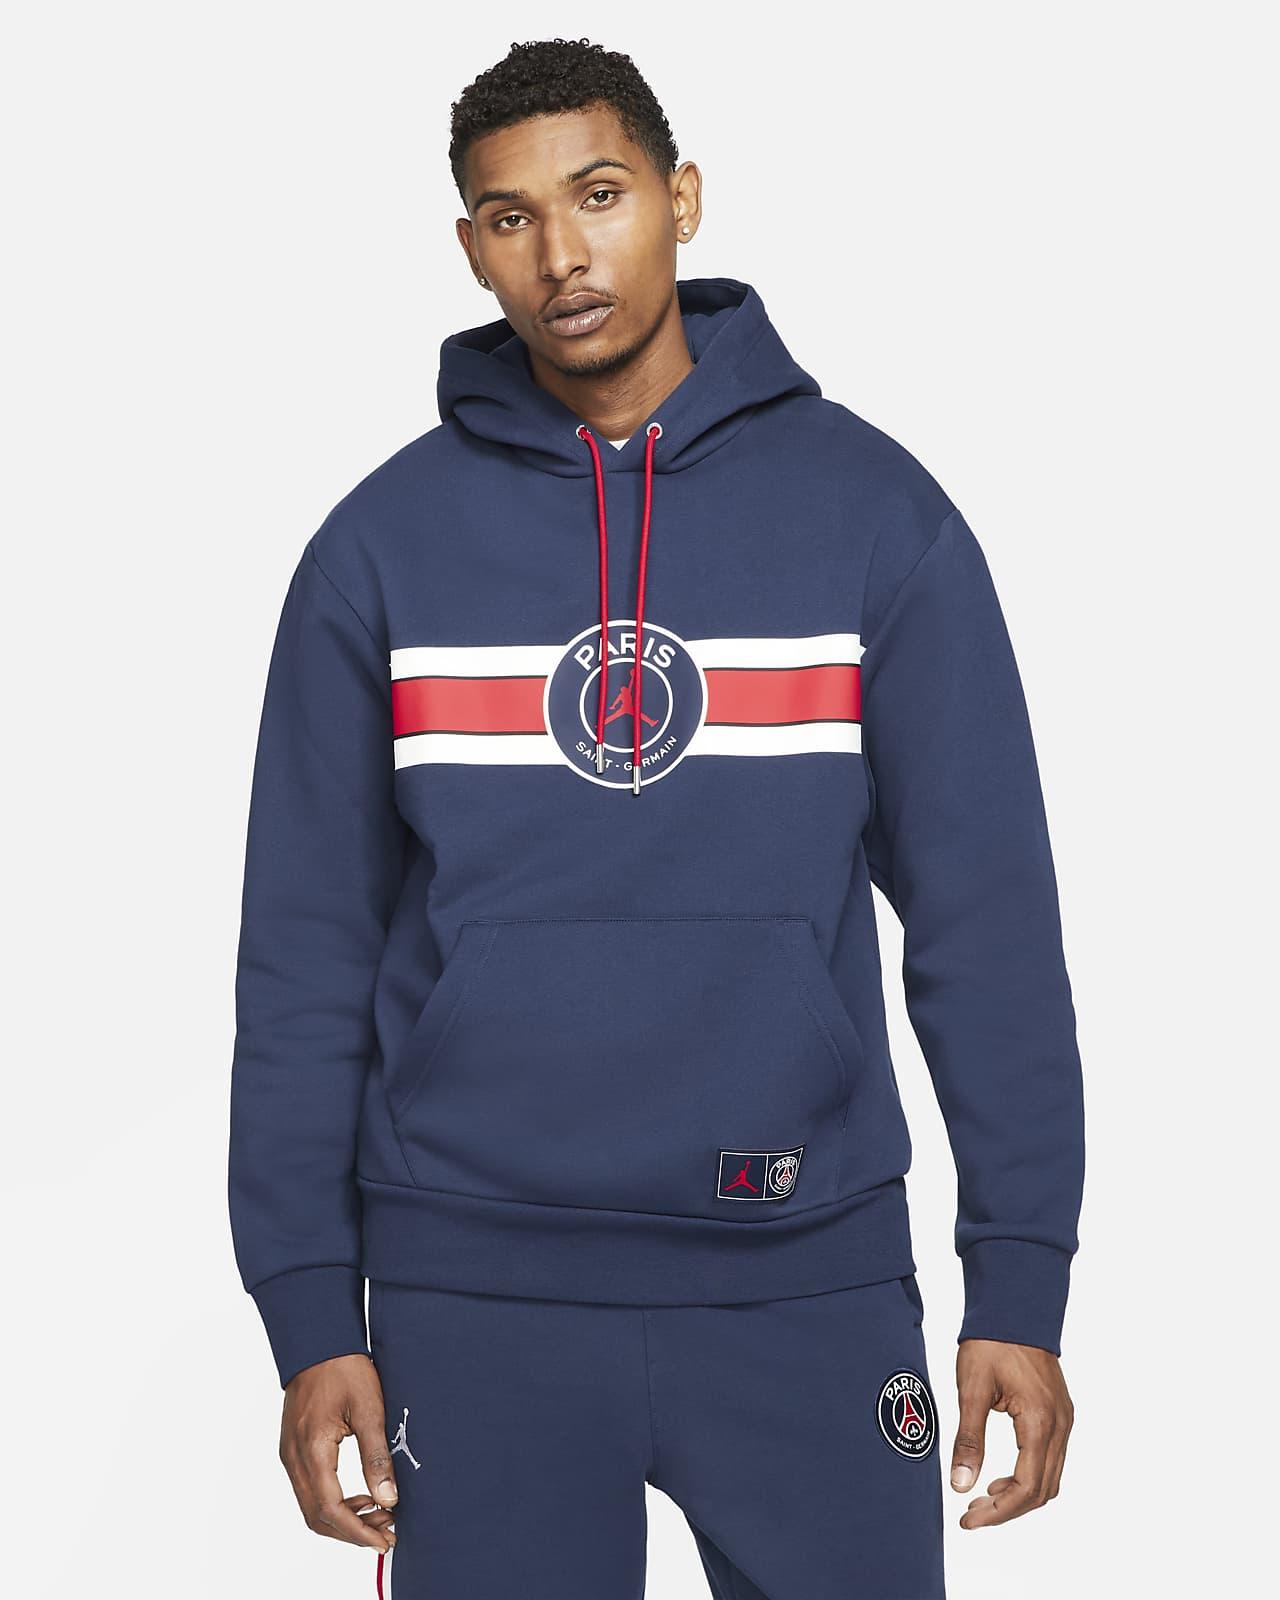 Hoodie pullover de lã cardada Paris Saint-Germain para homem